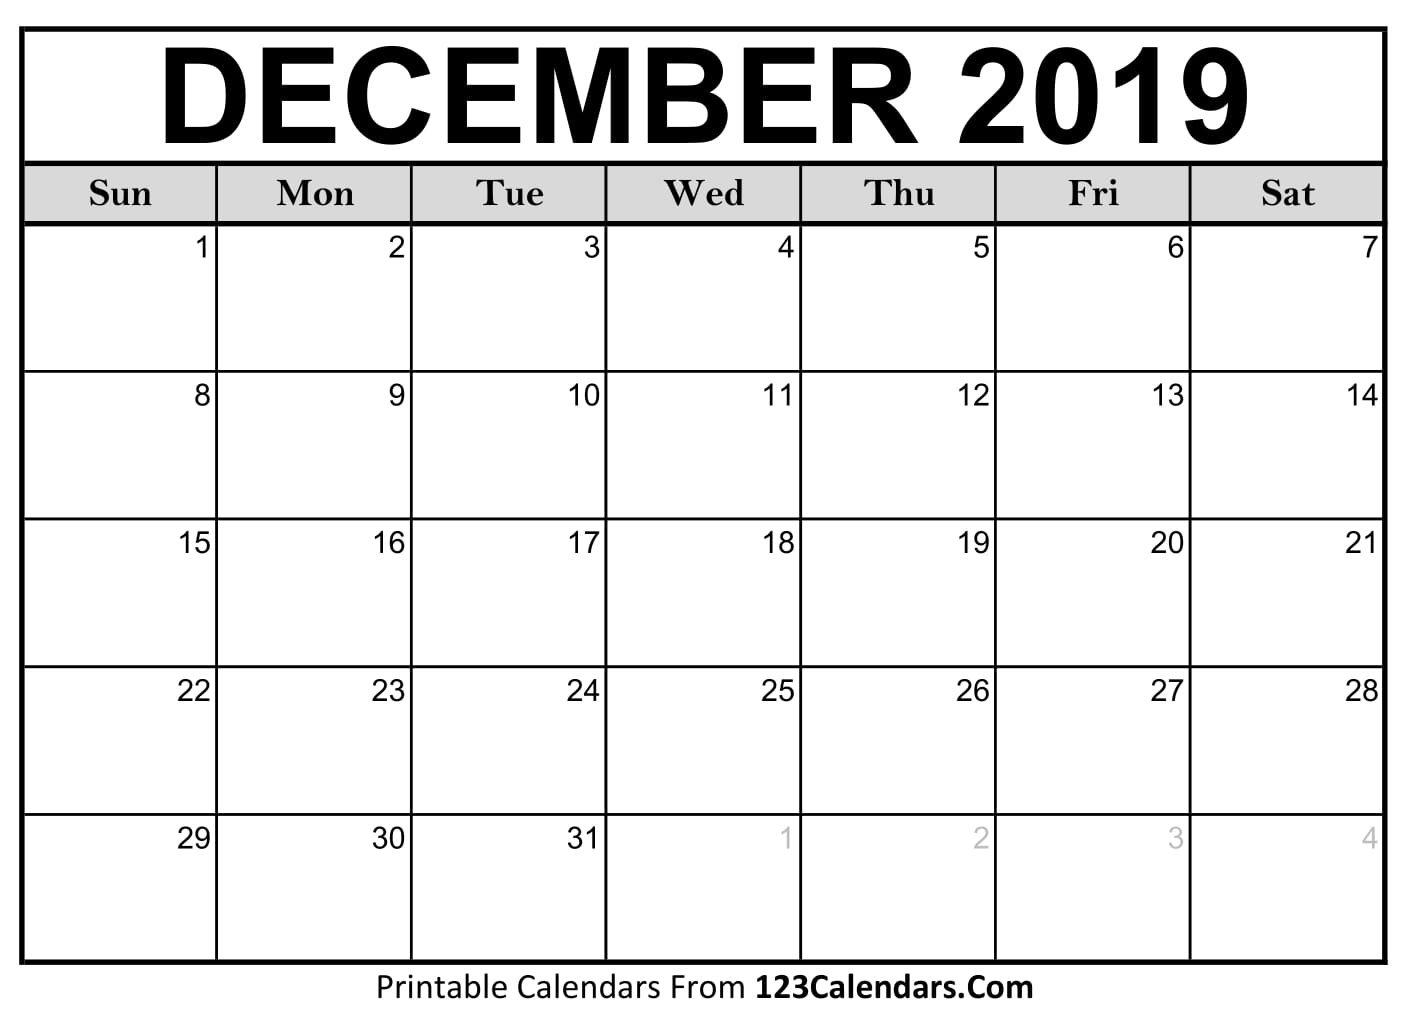 December 2019 Printable Calendar | 123Calendars January 2019 Calendar 123Calendars